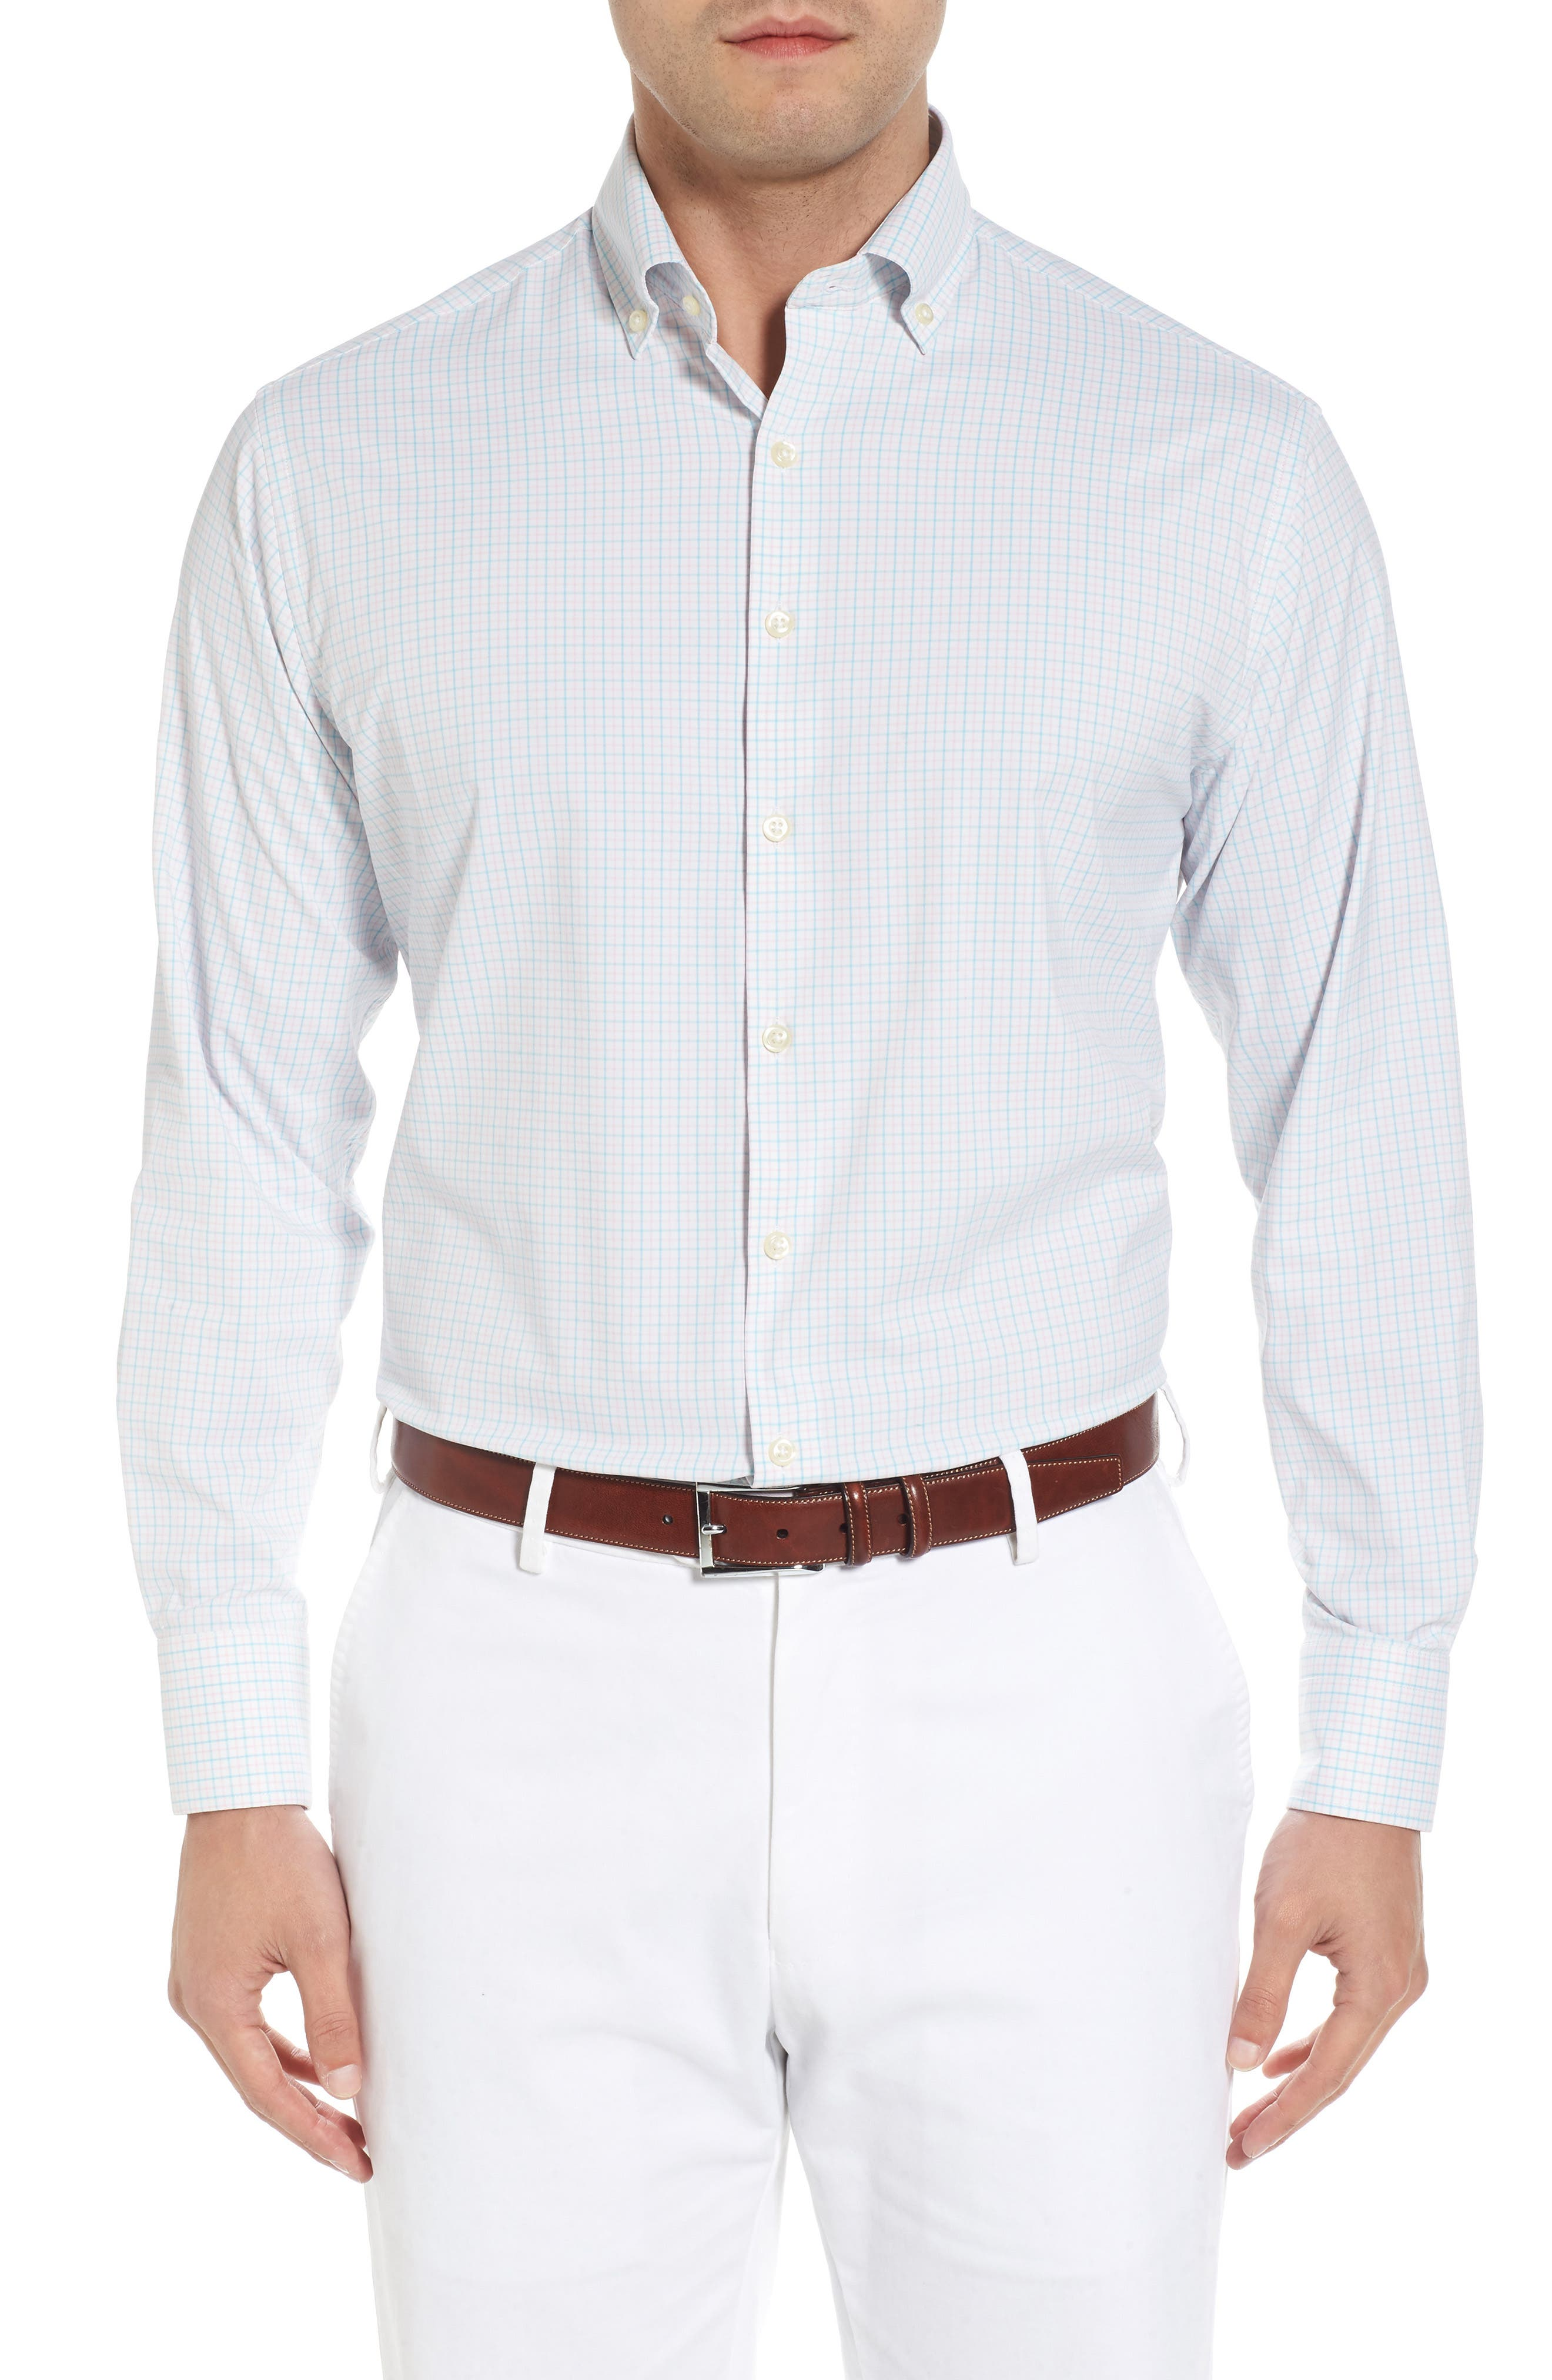 Waldorf Regular Fit Tattersall Performance Sport Shirt,                         Main,                         color, White/ Piglet Pink